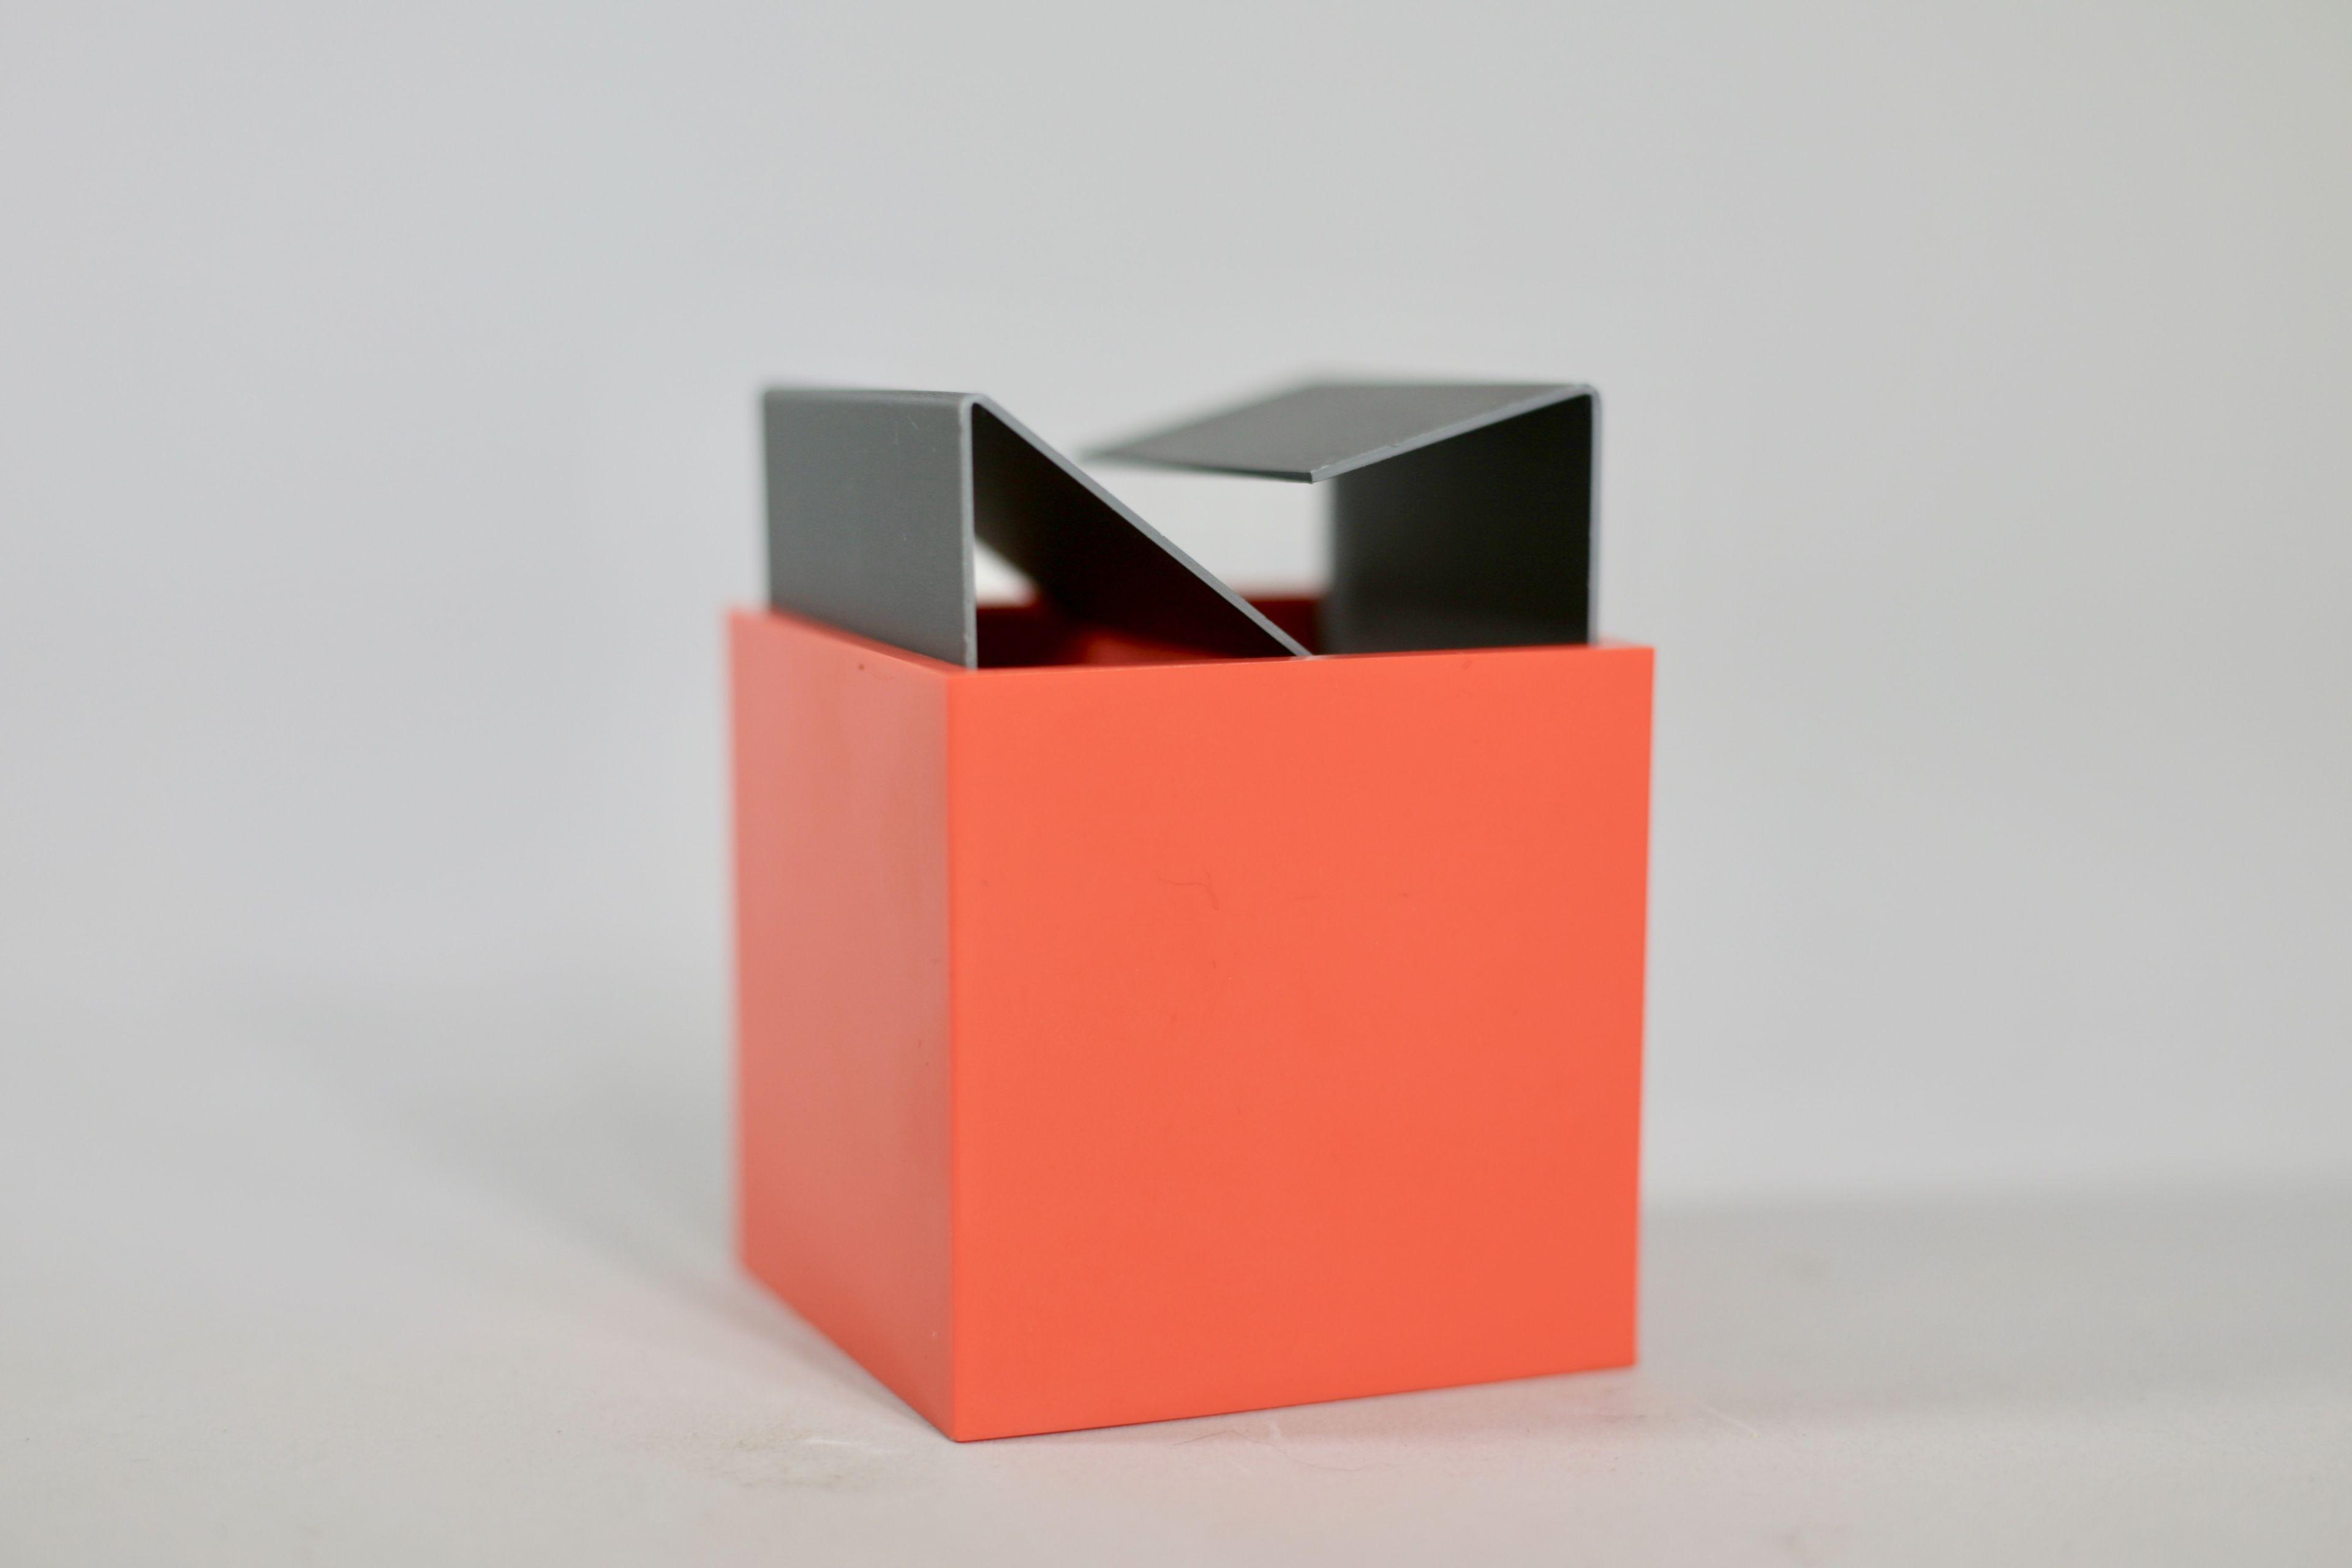 Credenza Danese : Vintage orange ashtray by bruno munari for danese milano design market